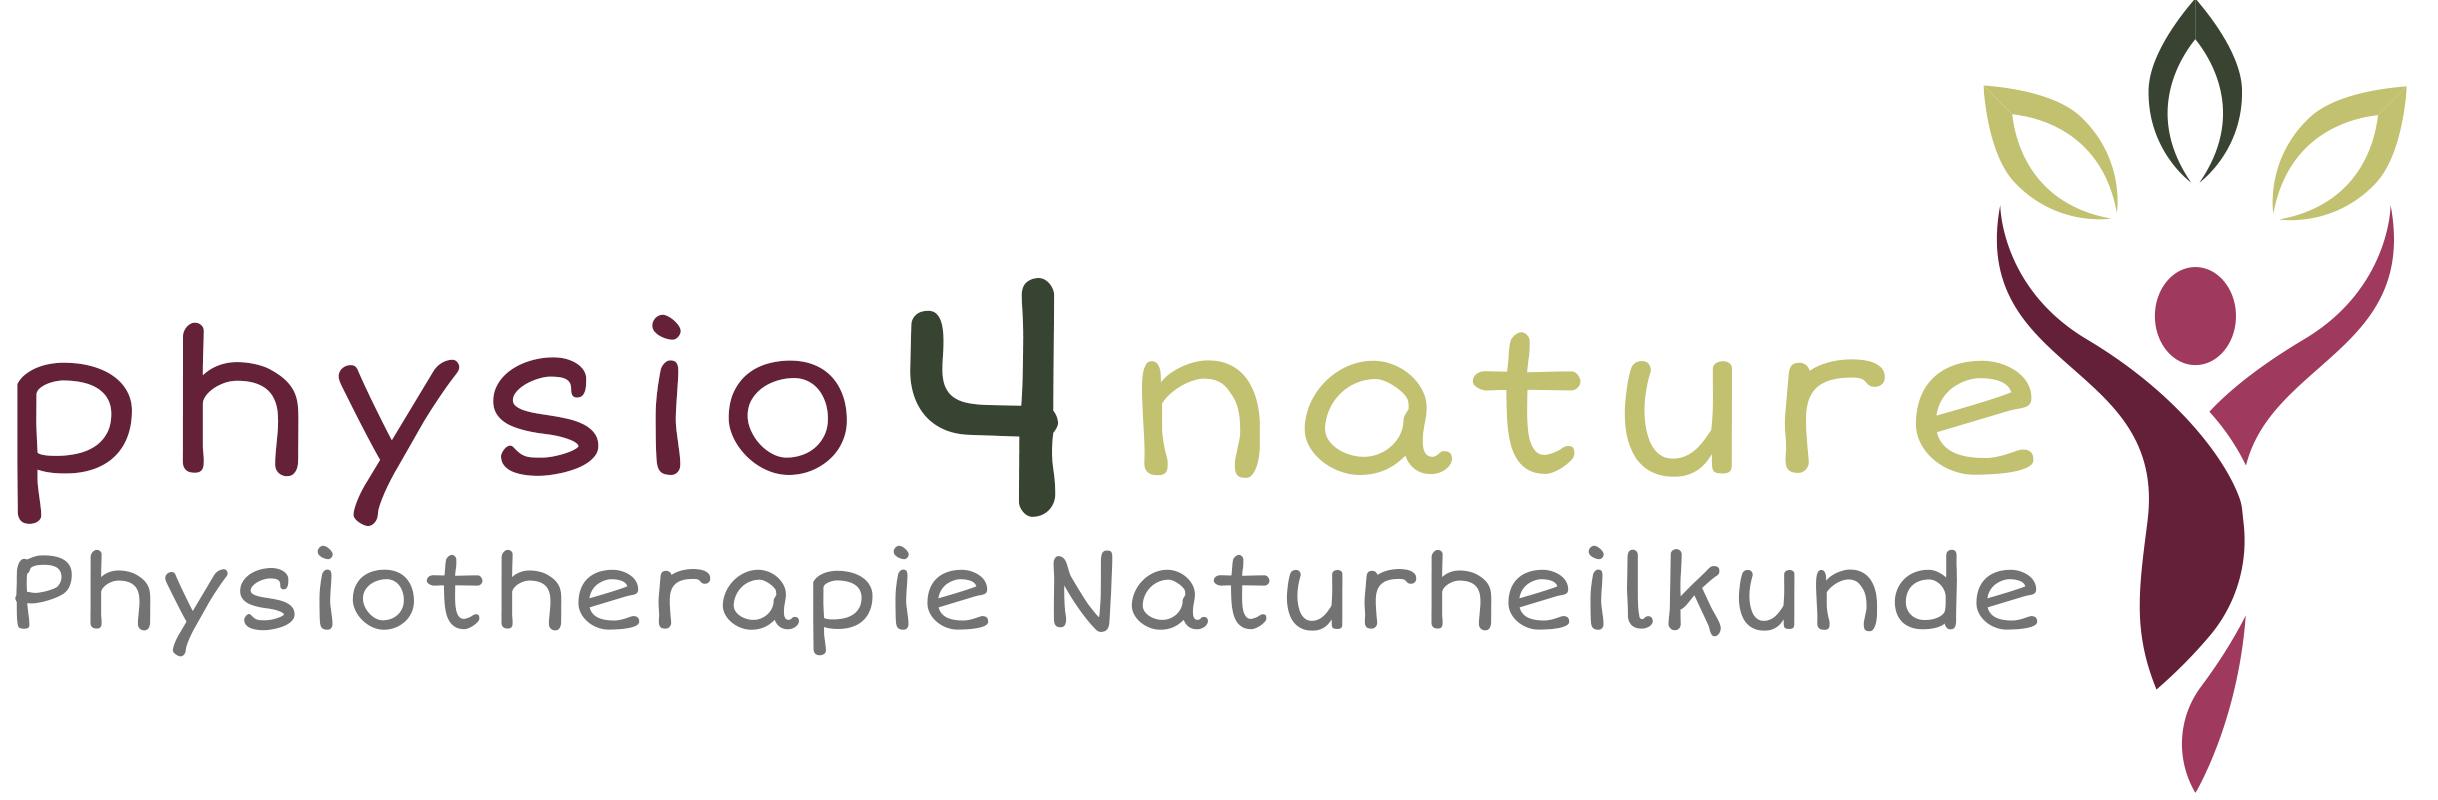 physio4nature.de